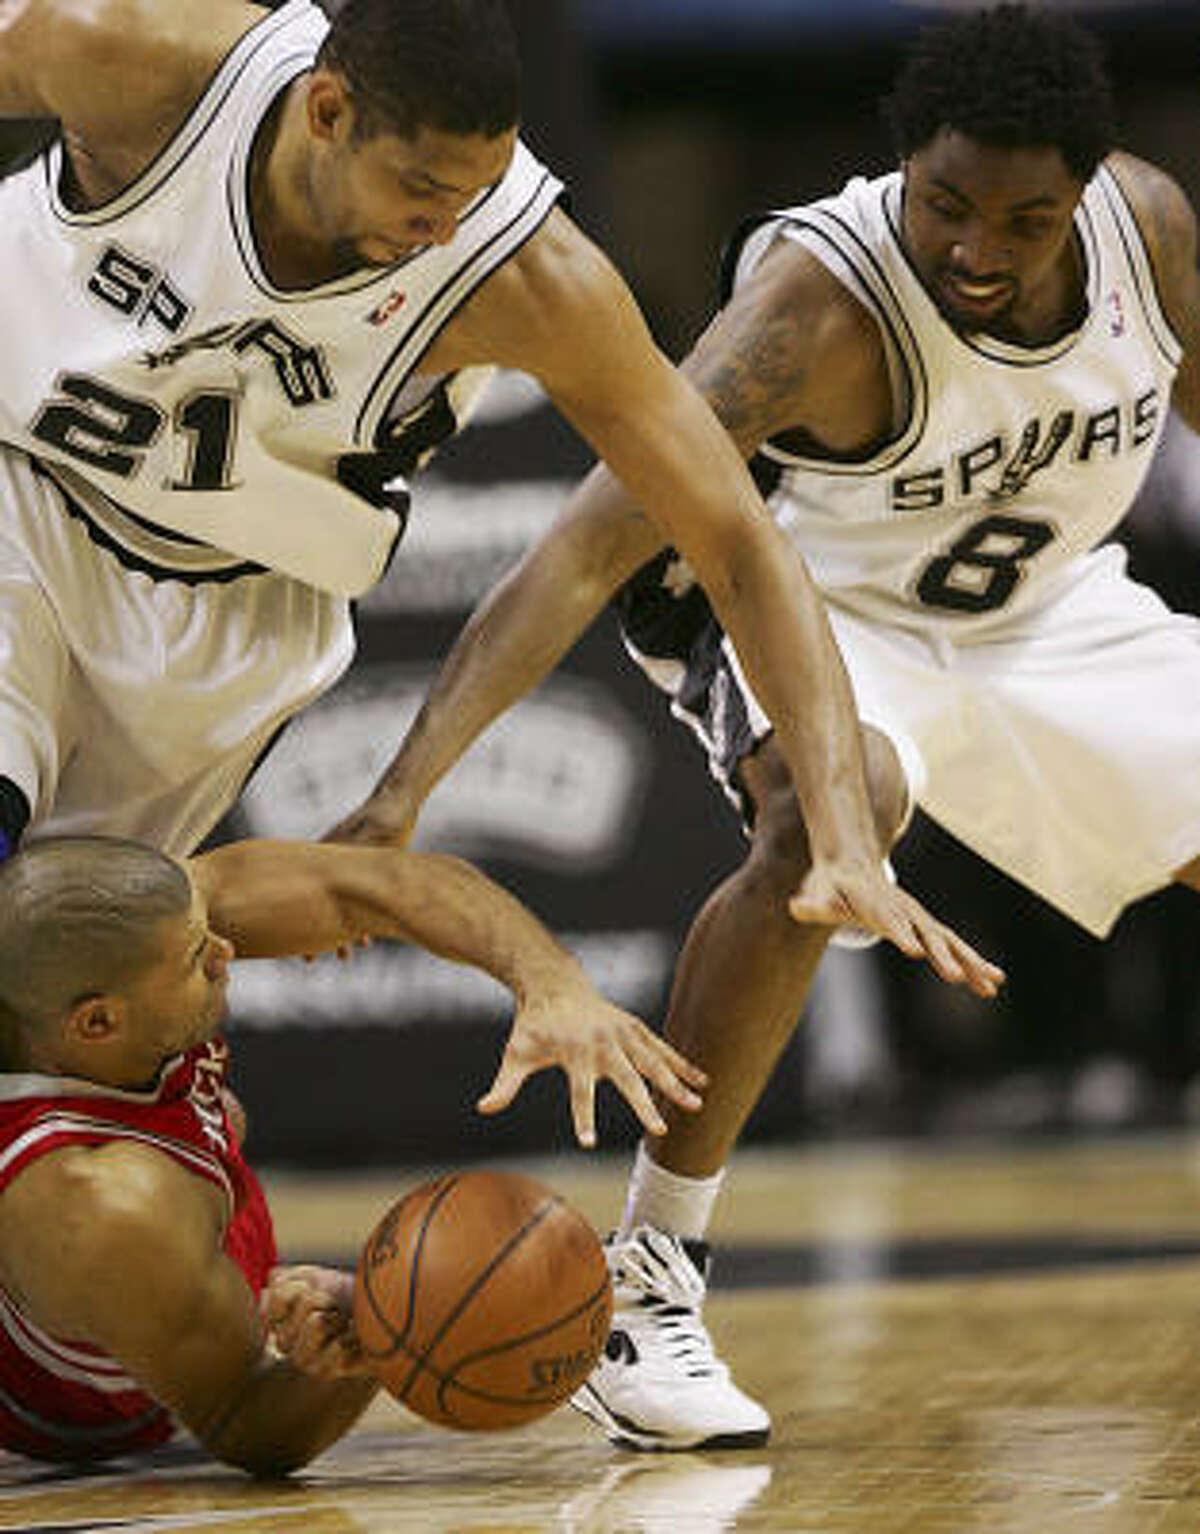 Spurs forward Tim Duncan (21) and Roger Mason Jr. (8) battle Shane Battier for a loose ball.